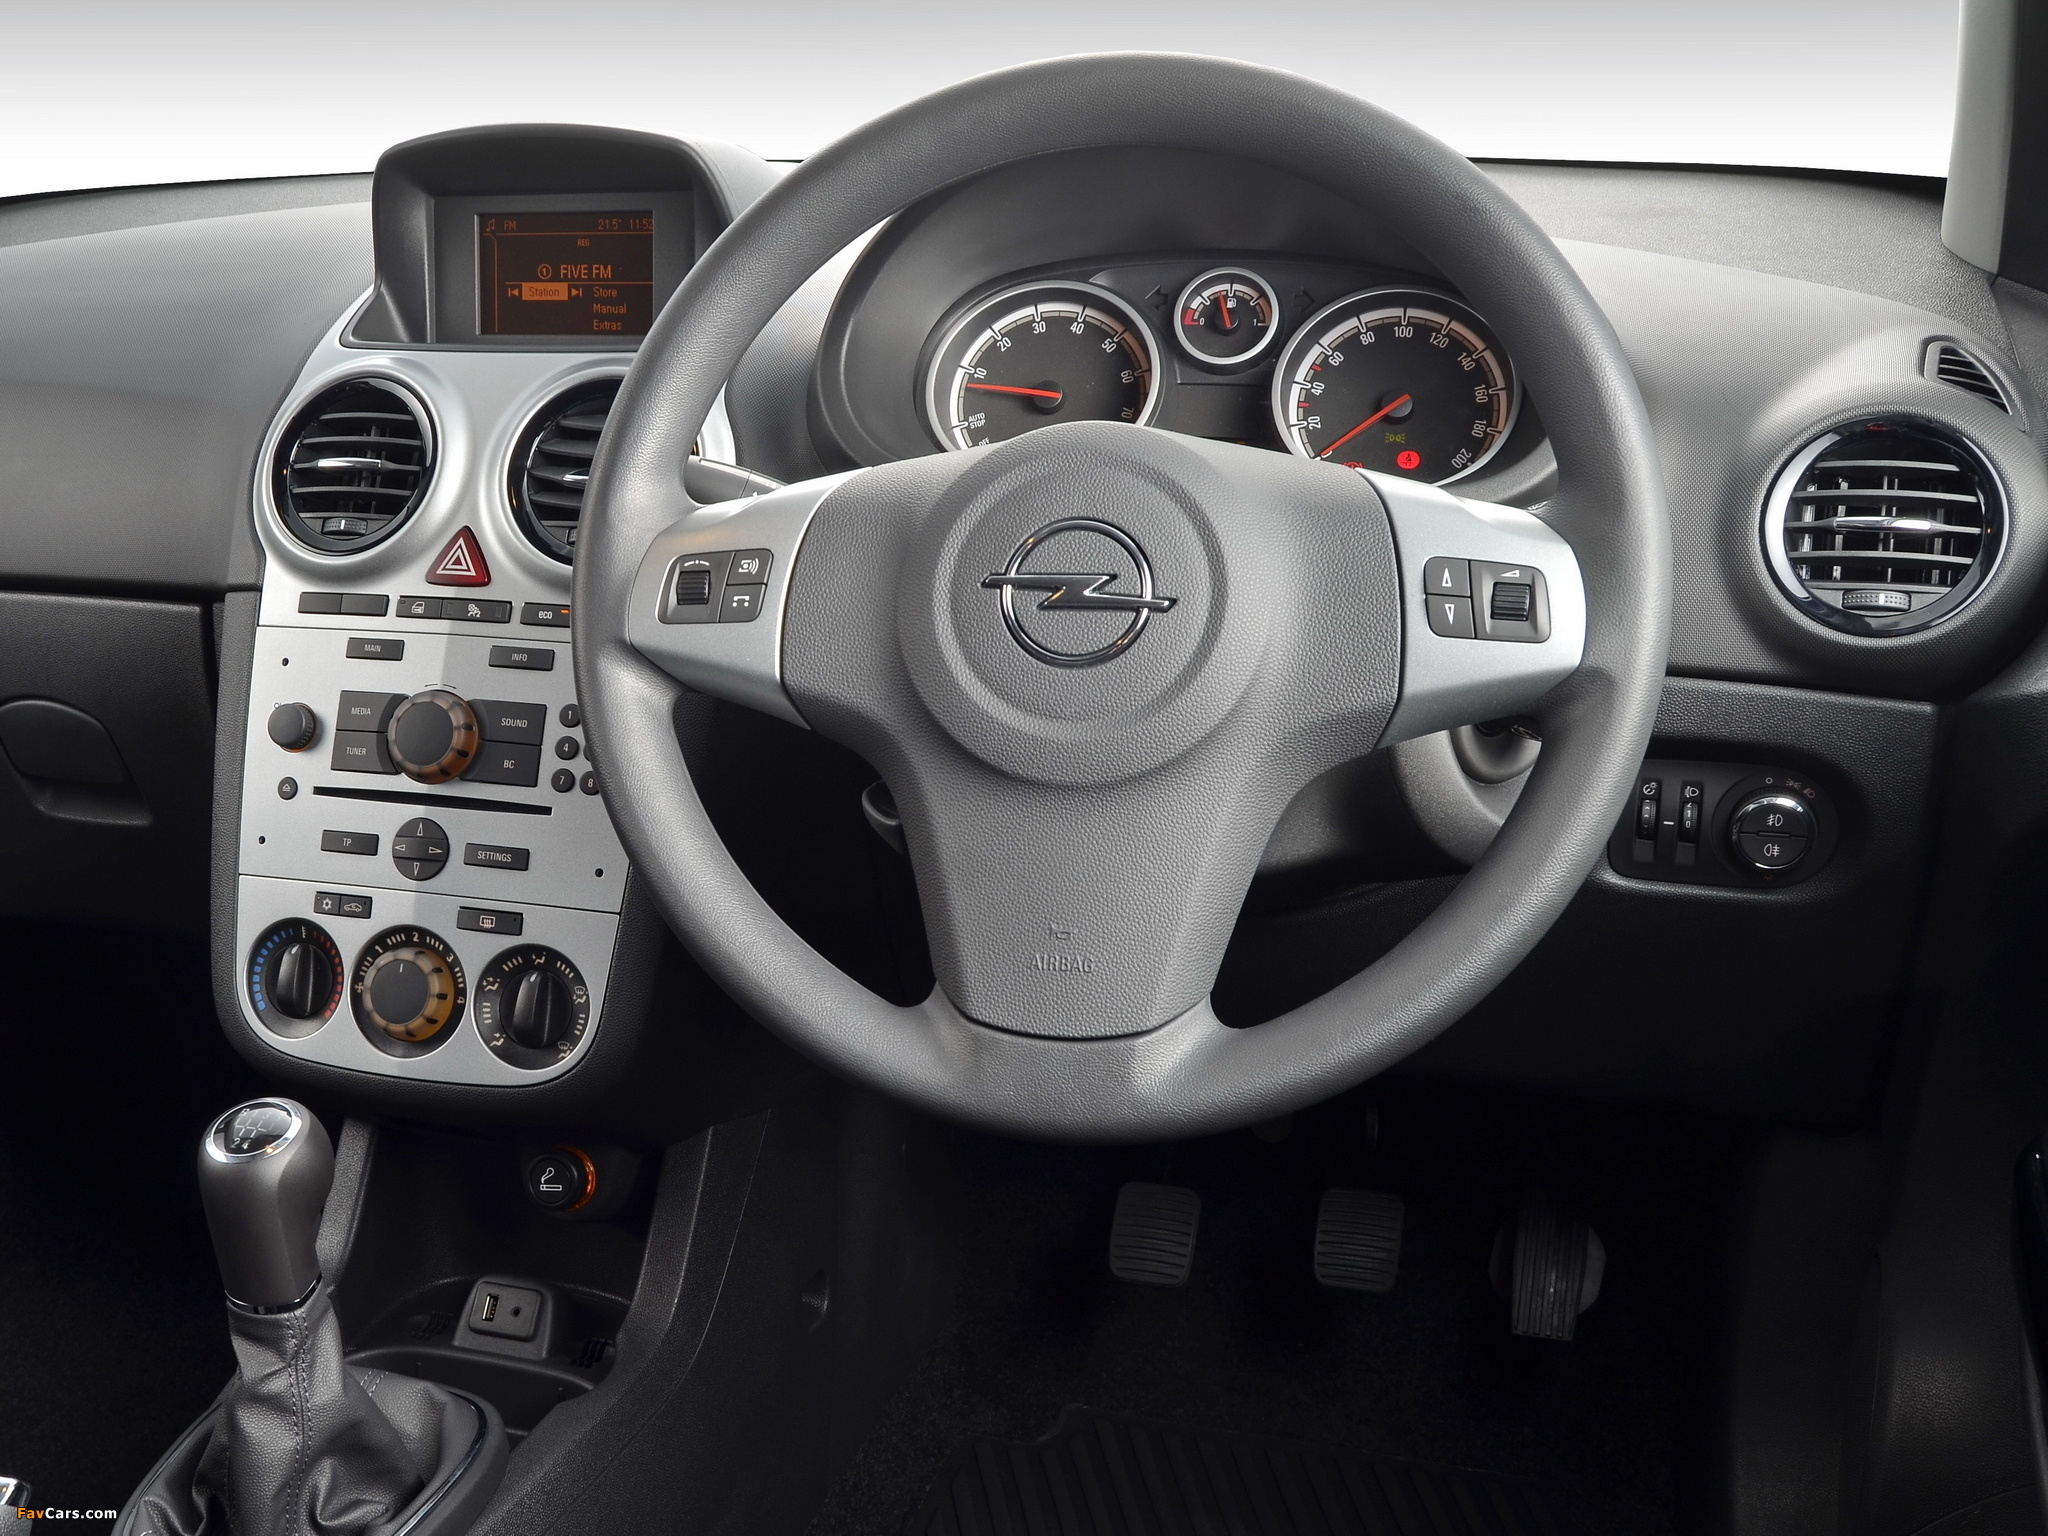 Opel corsa d (2006-2013) – общие проблемы